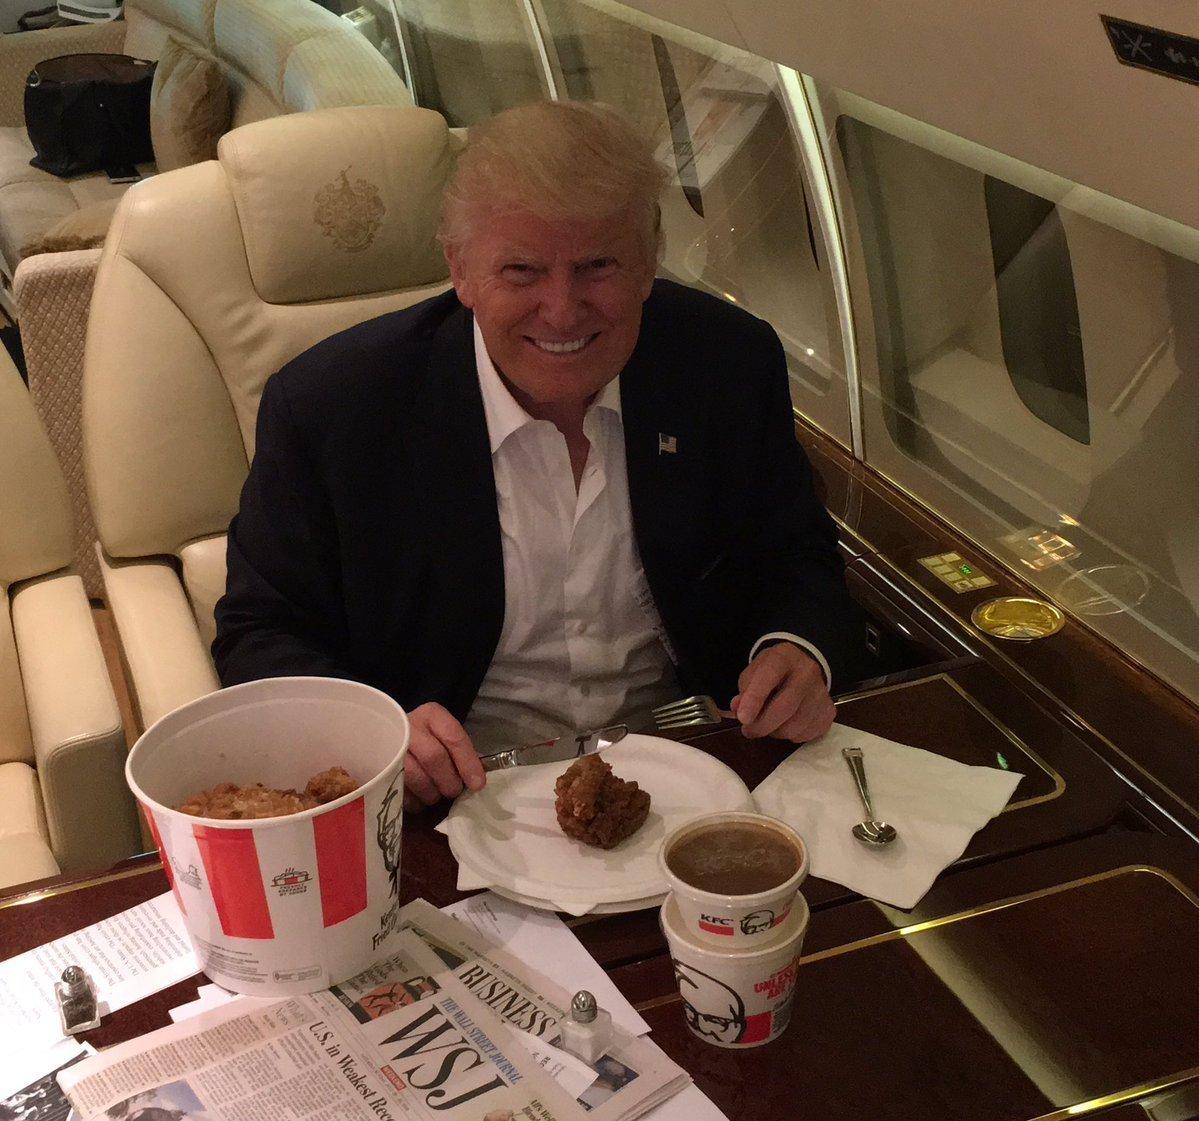 The Way Donald Trump Eats KFC Is A Total